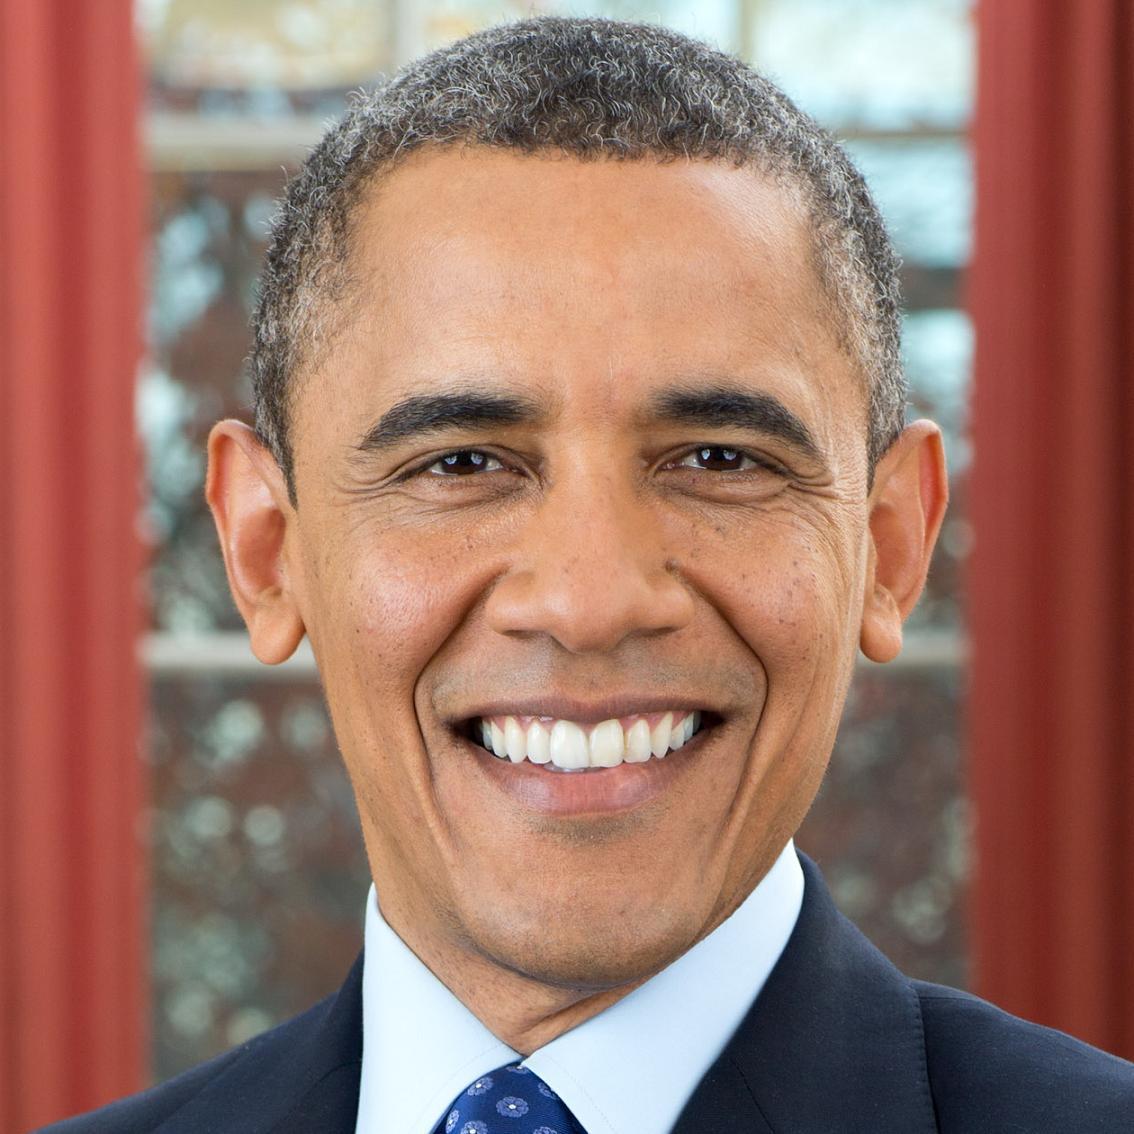 Barack Obama Bio, Net Worth, Facts